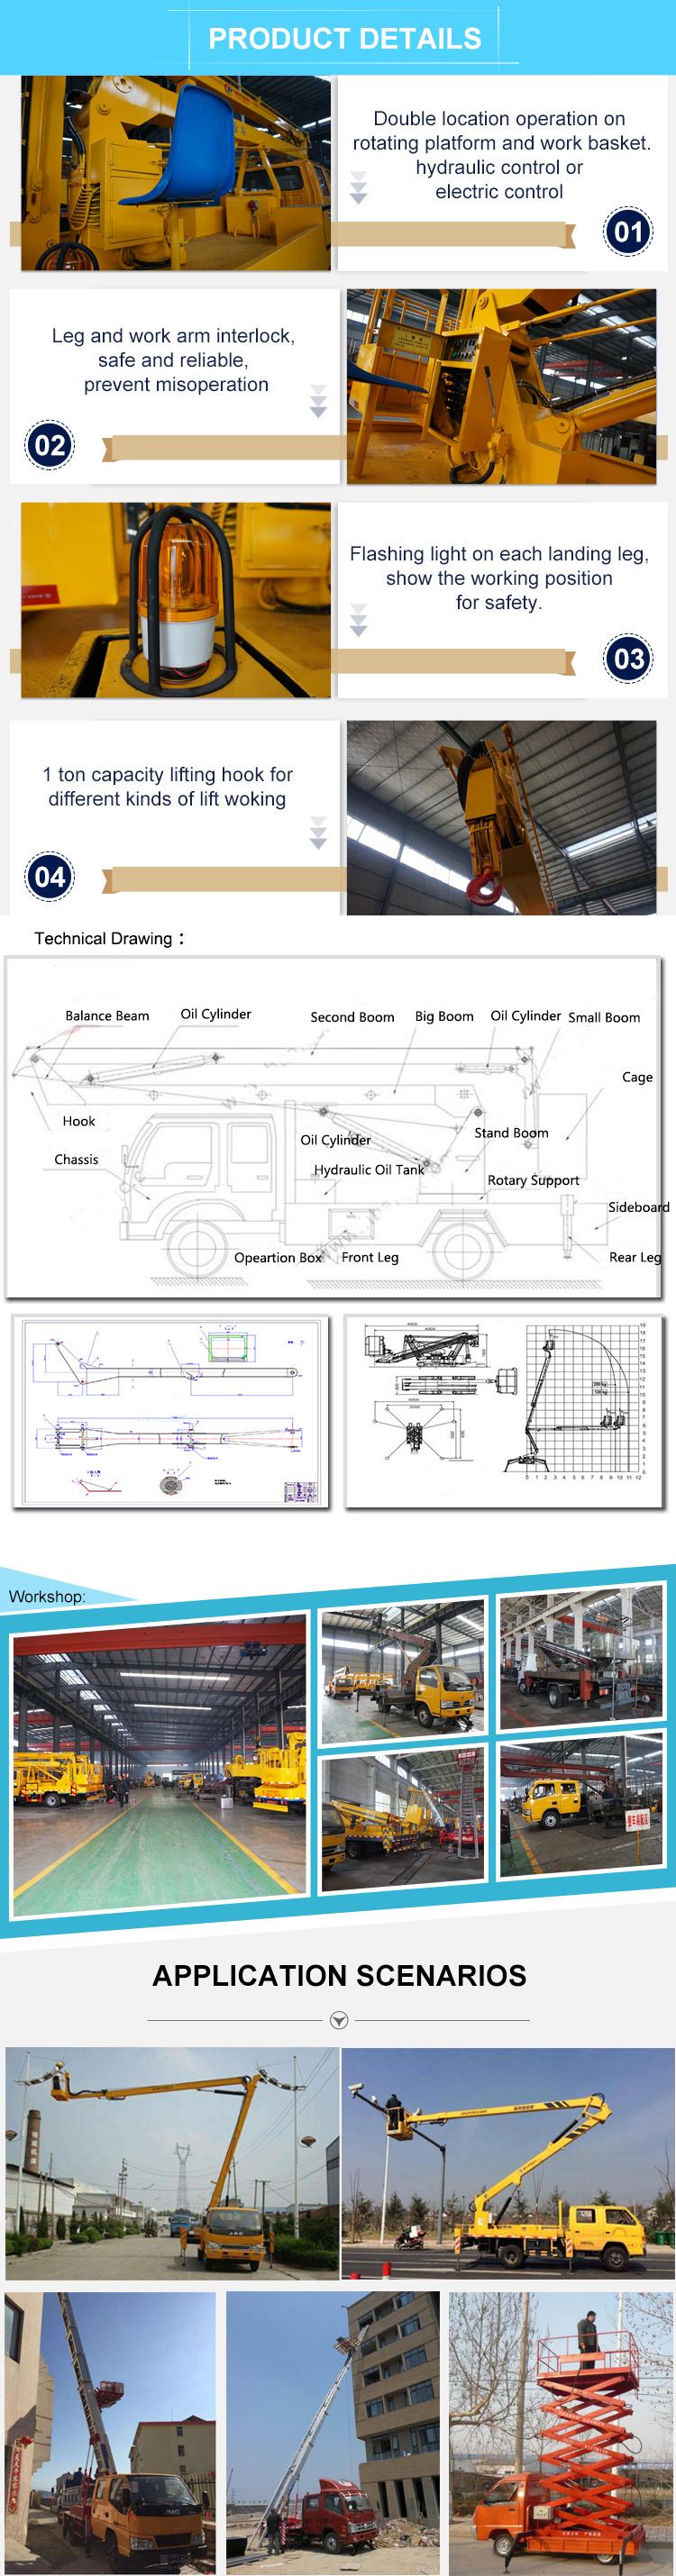 Lift Bucket on Hydraulic Platform Cherry Picker New Aerial Truck for Sale